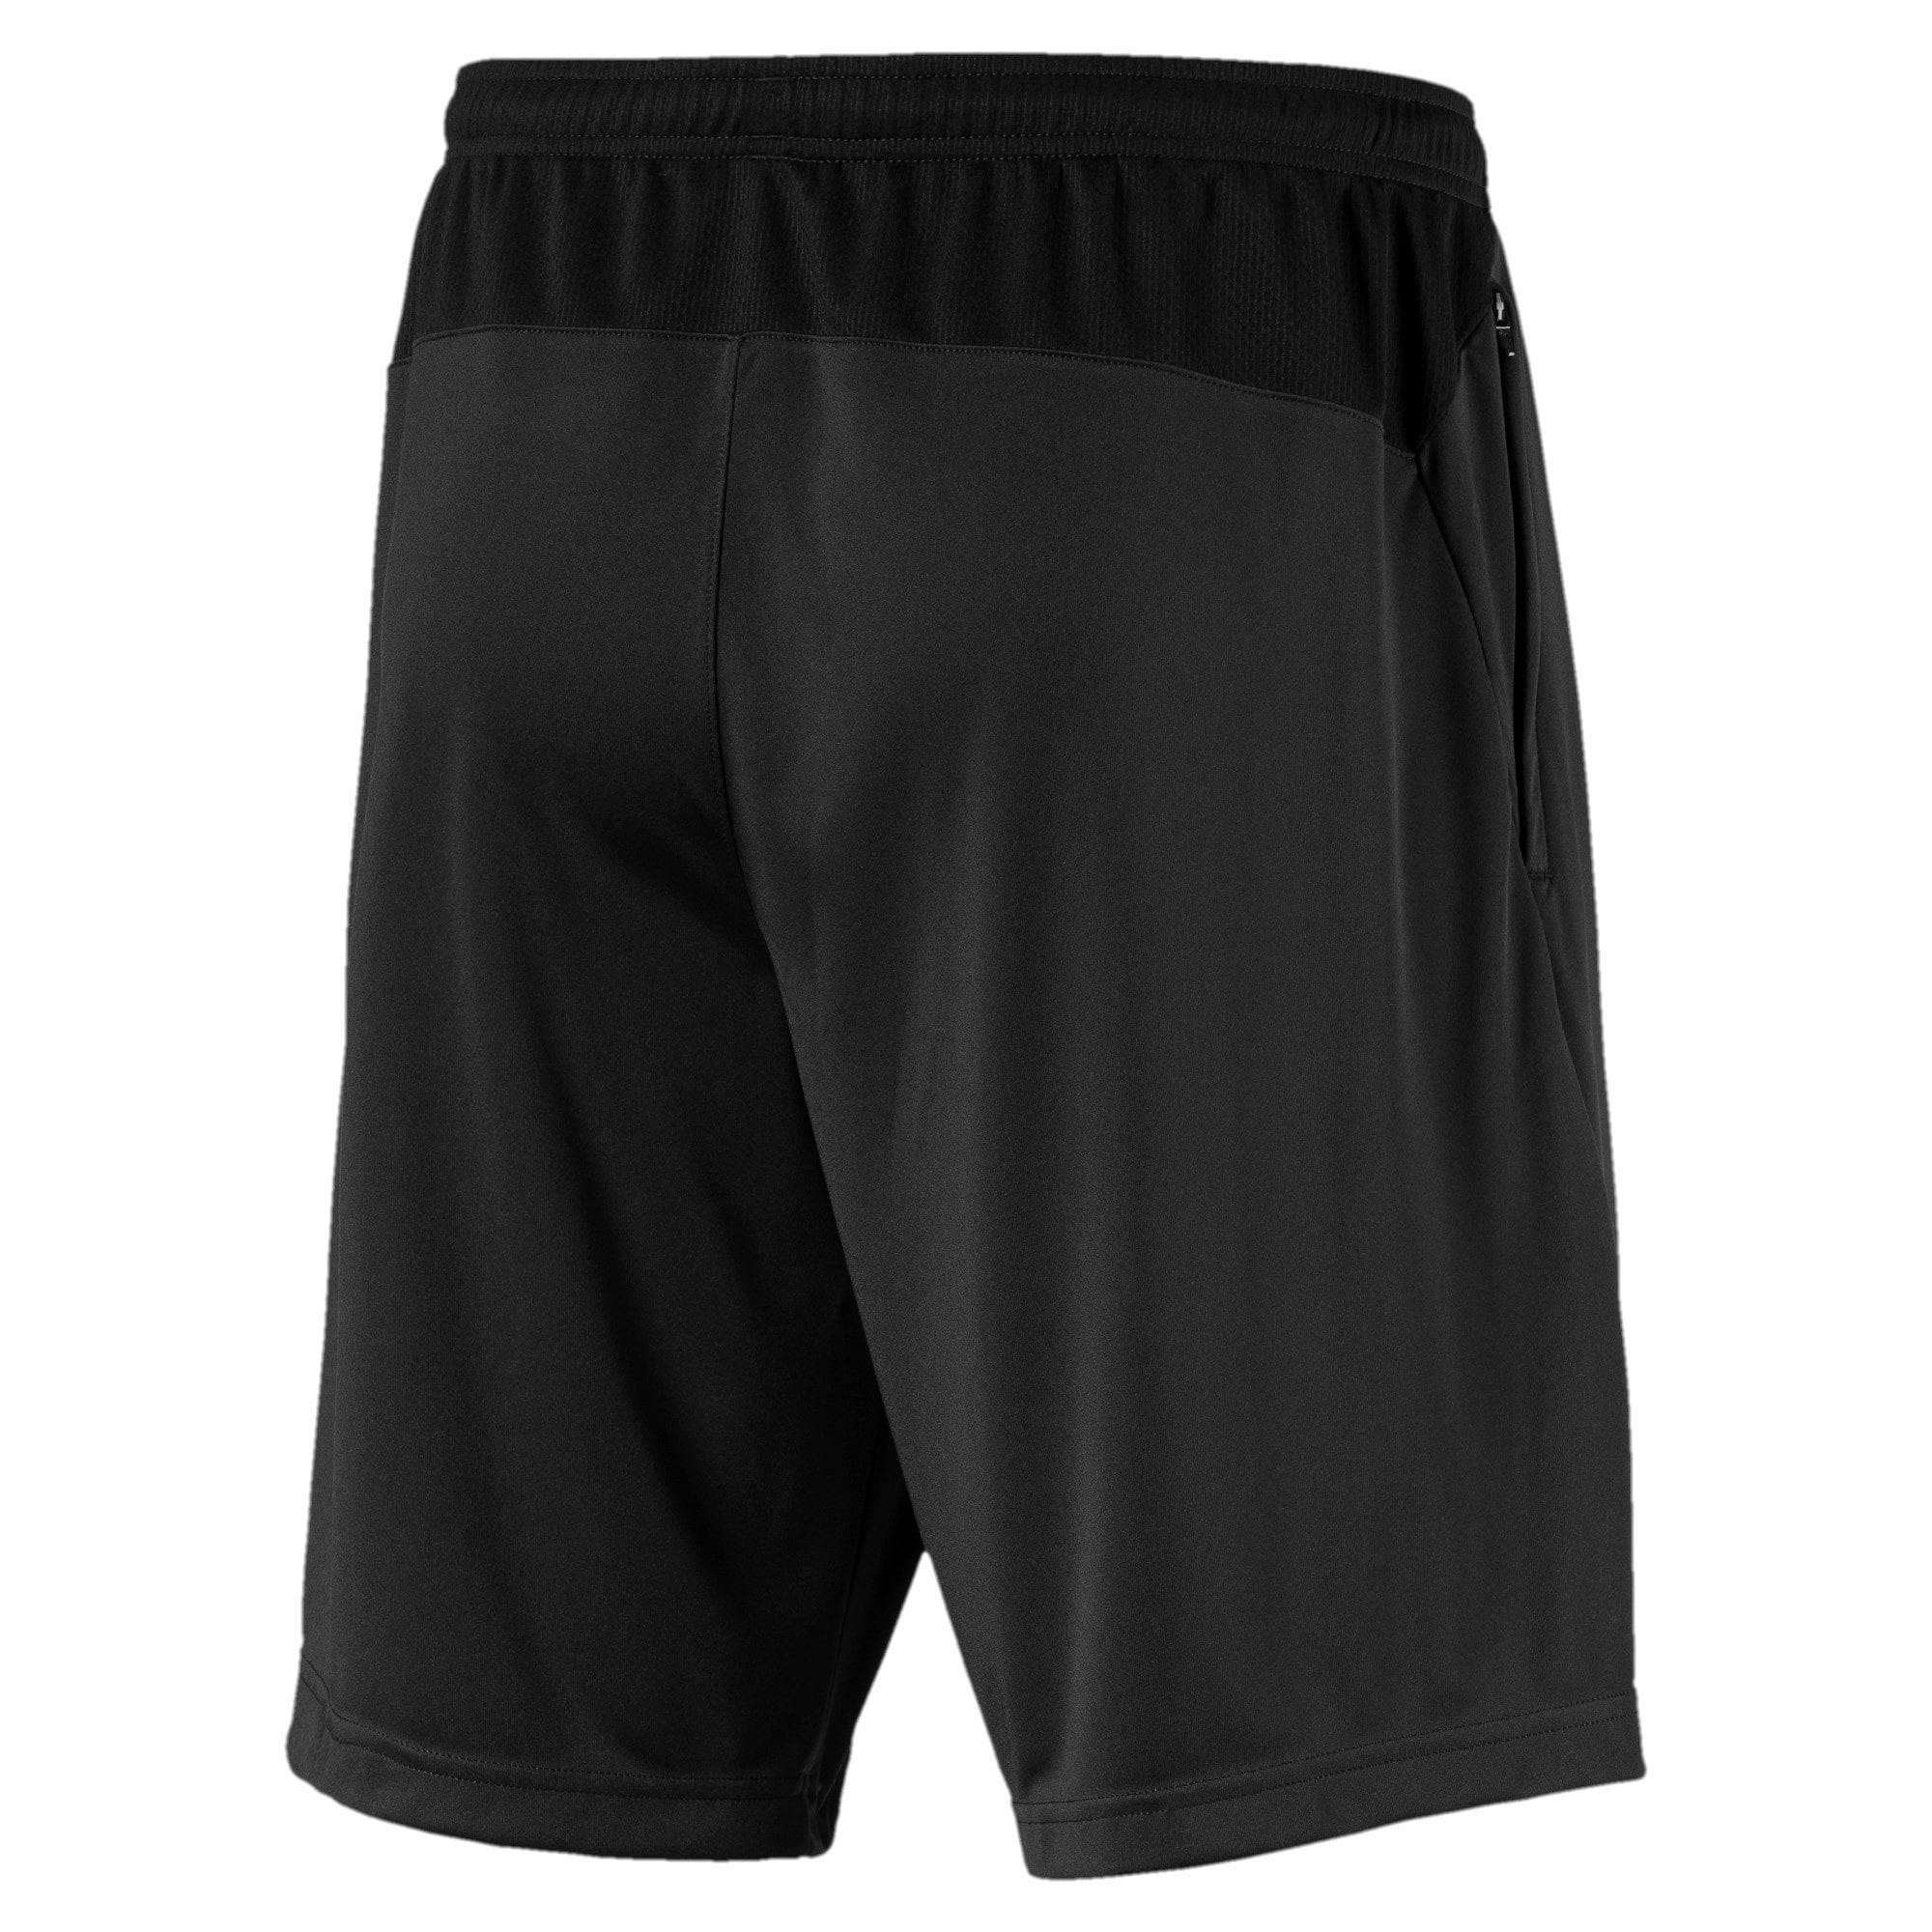 Thumbnail 5 of Manchester City FC Men's Training Shorts, Puma Black-Team Light Blue, medium